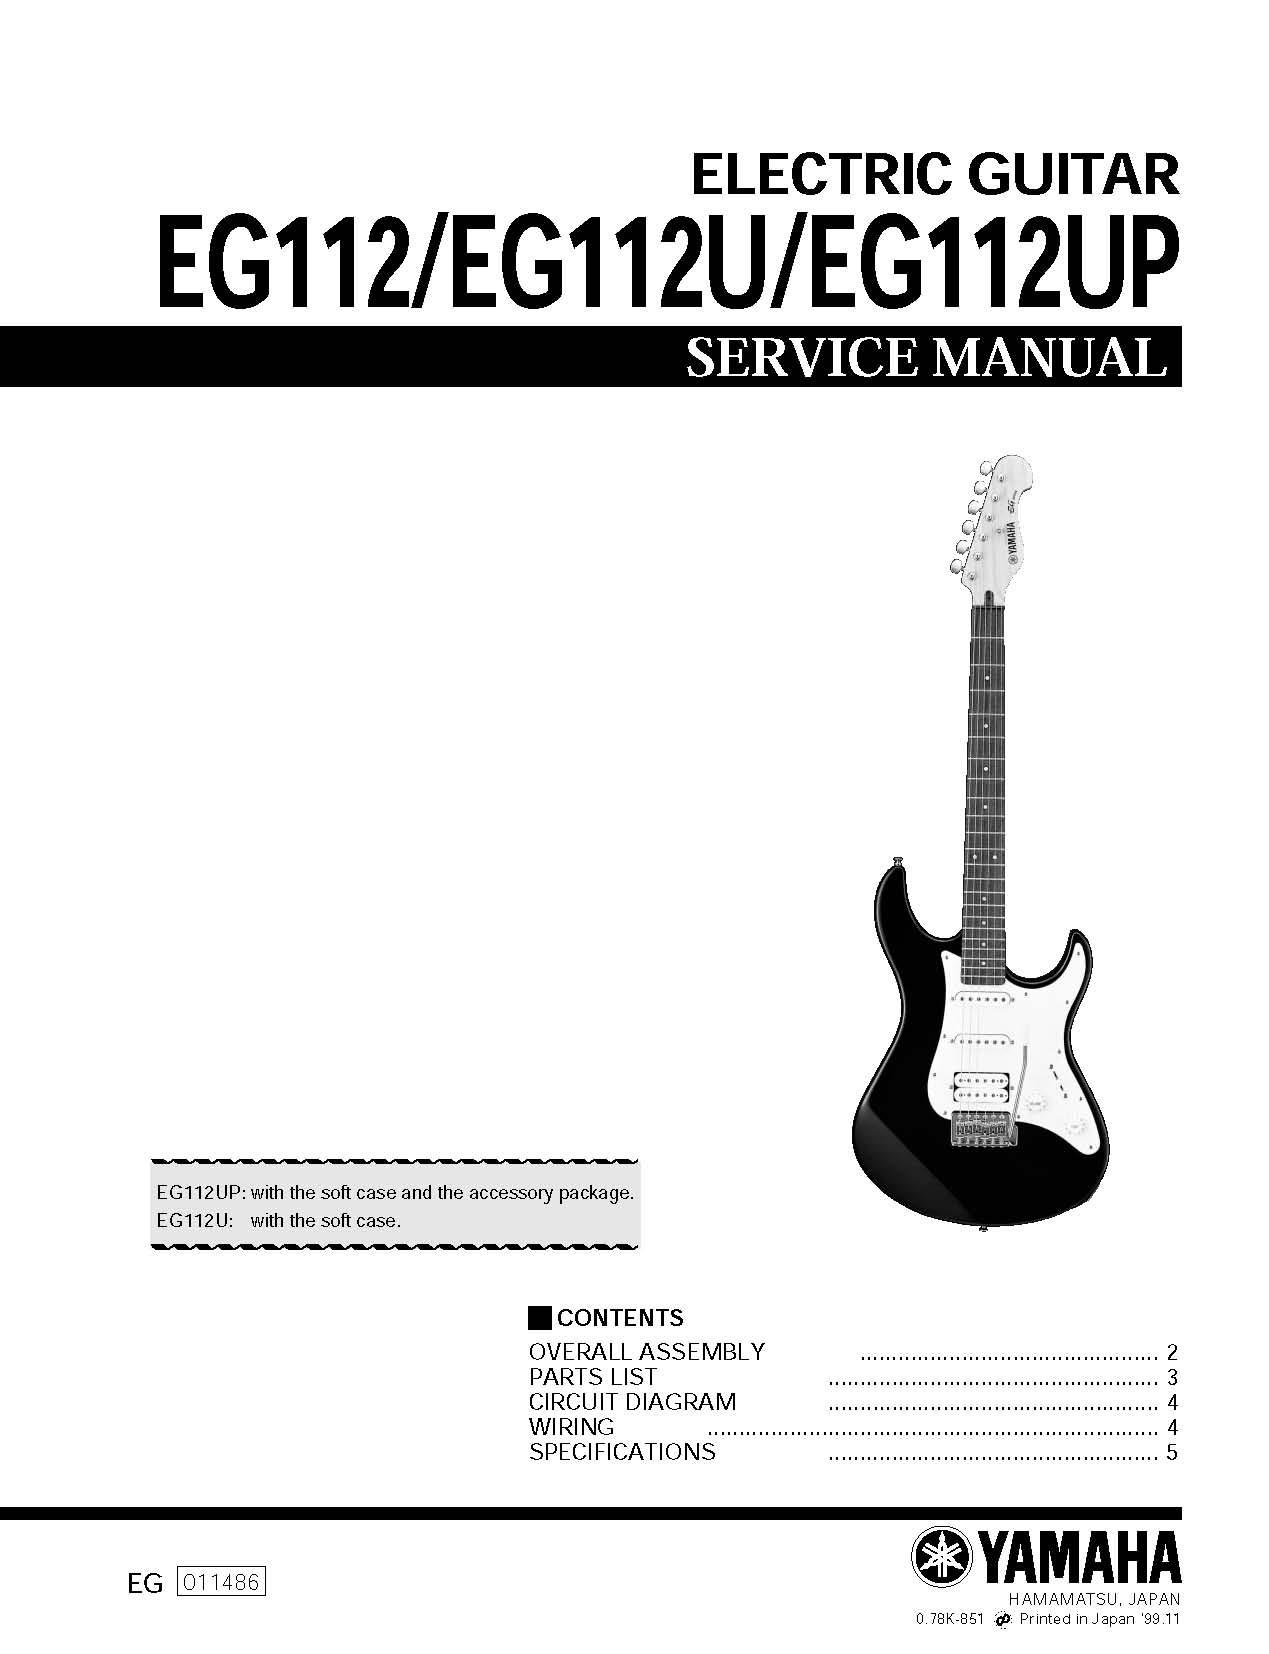 wiring diagram for yamaha eg112 electric guitar wiring diagram  yamaha eg112c wiring diagram #9